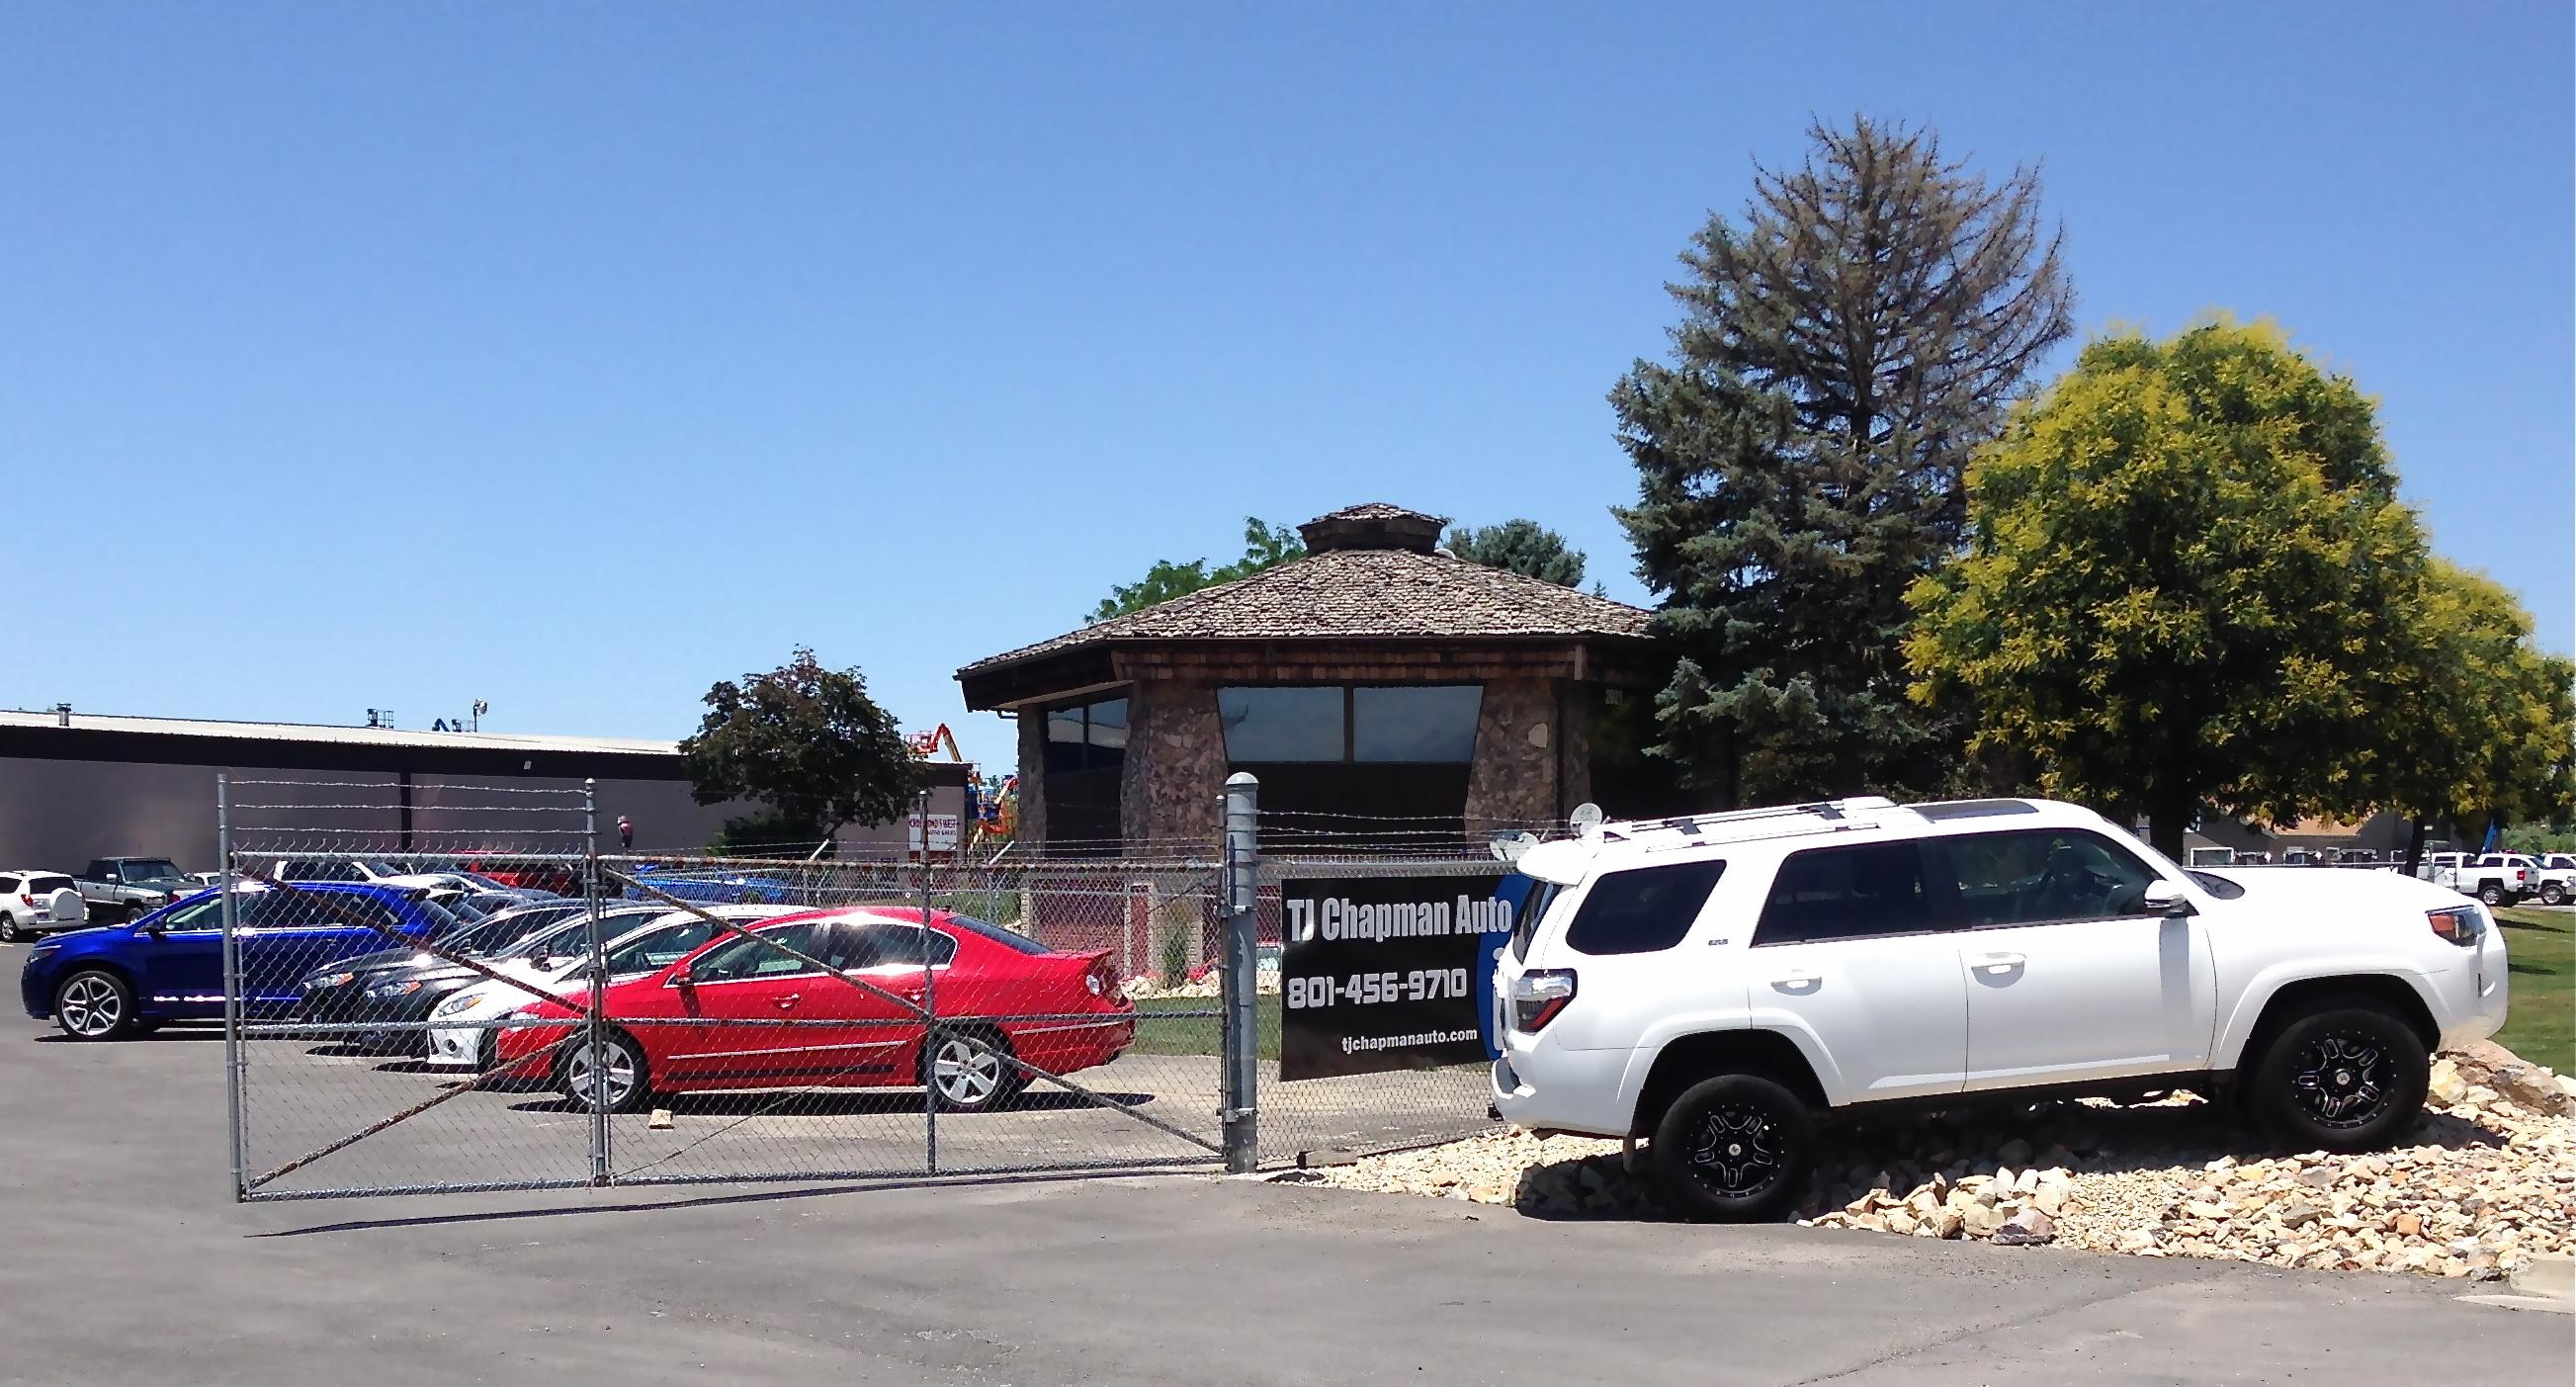 TJ Chapman Auto - Salt Lake City, UT 84116 - (801)456-9710 | ShowMeLocal.com